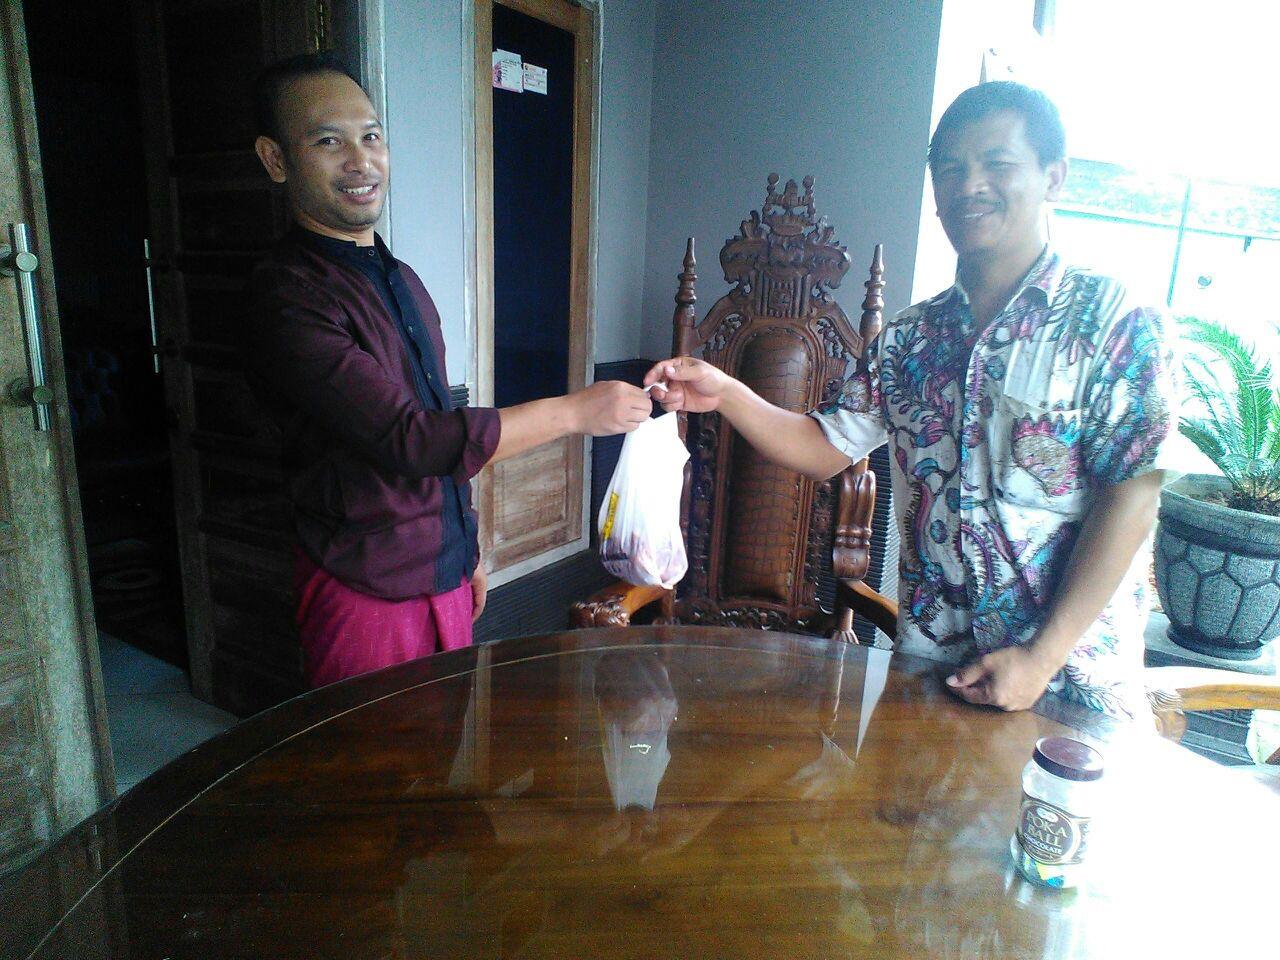 Pemberian daging Kurban ke kades Sukoraharjo  Kepanjen Bpk Moh. Bisri terimakasi kepada LDII